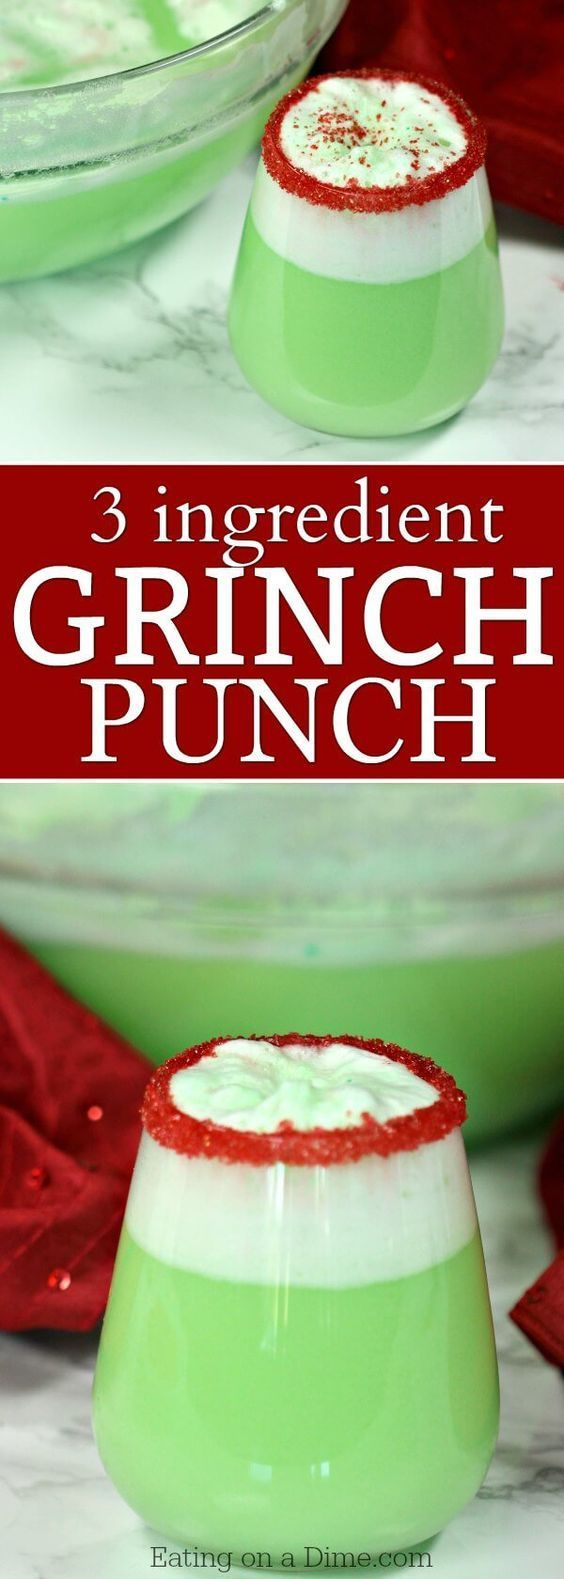 EASY GRINCH PUNCH RECIPE